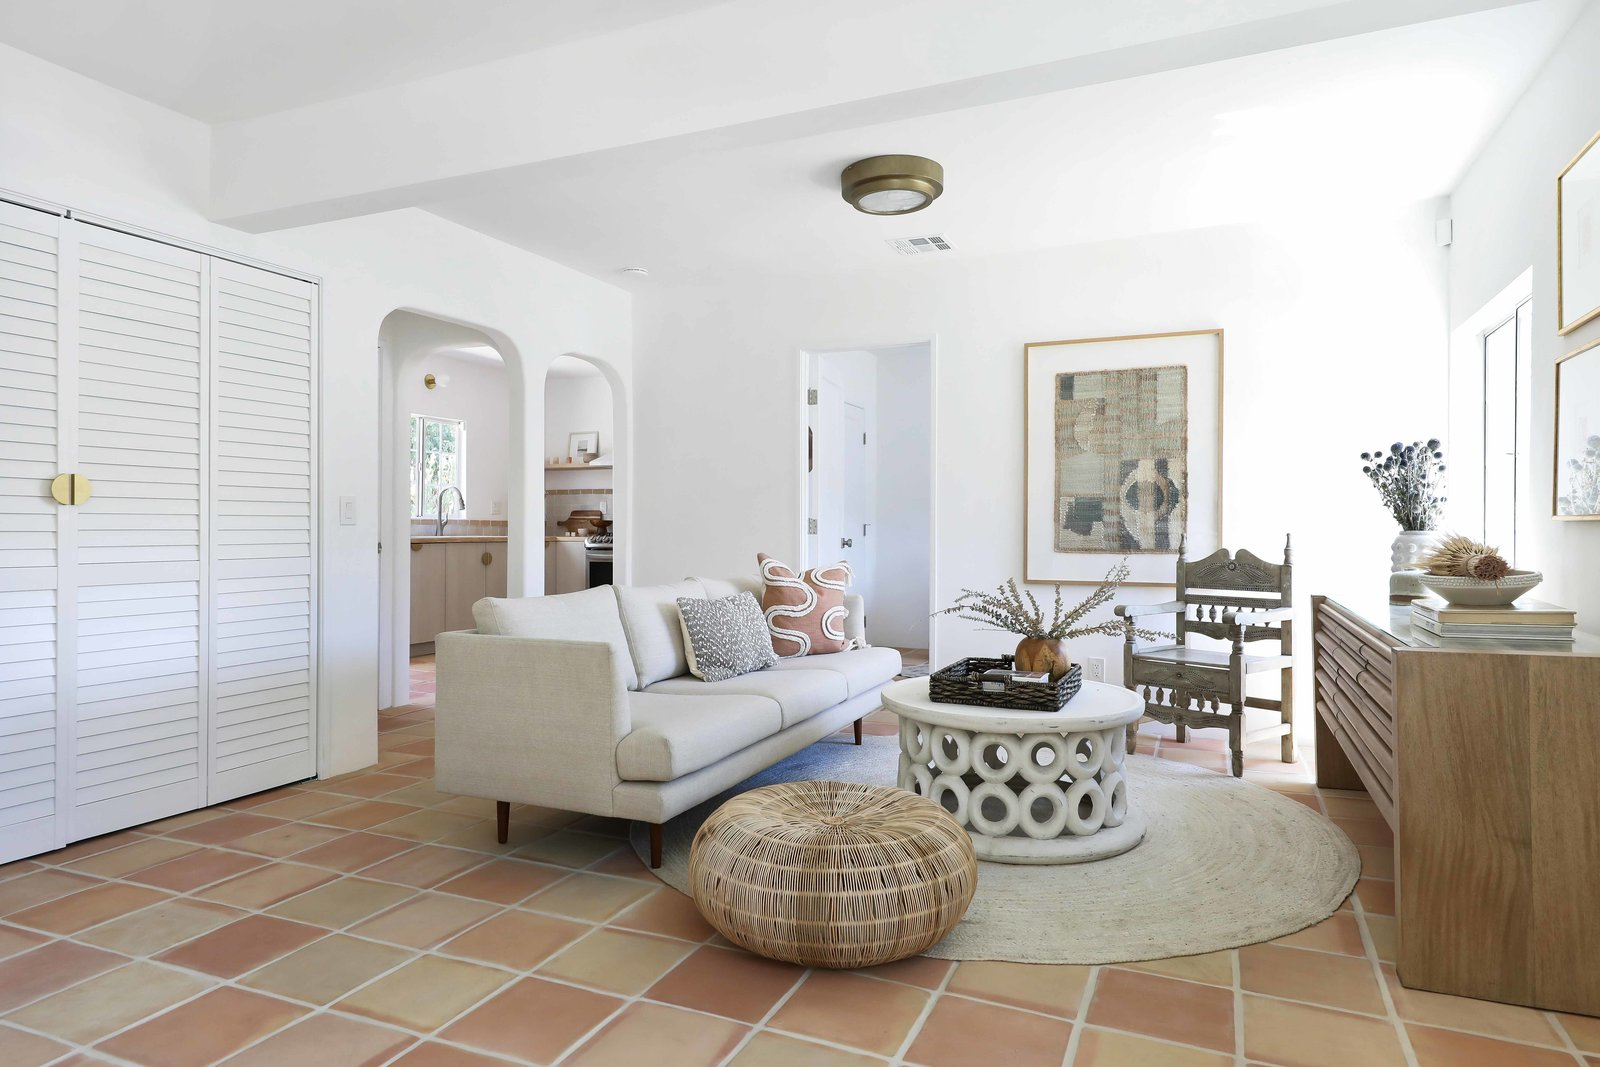 Los Angeles Spanish Bungalow living area